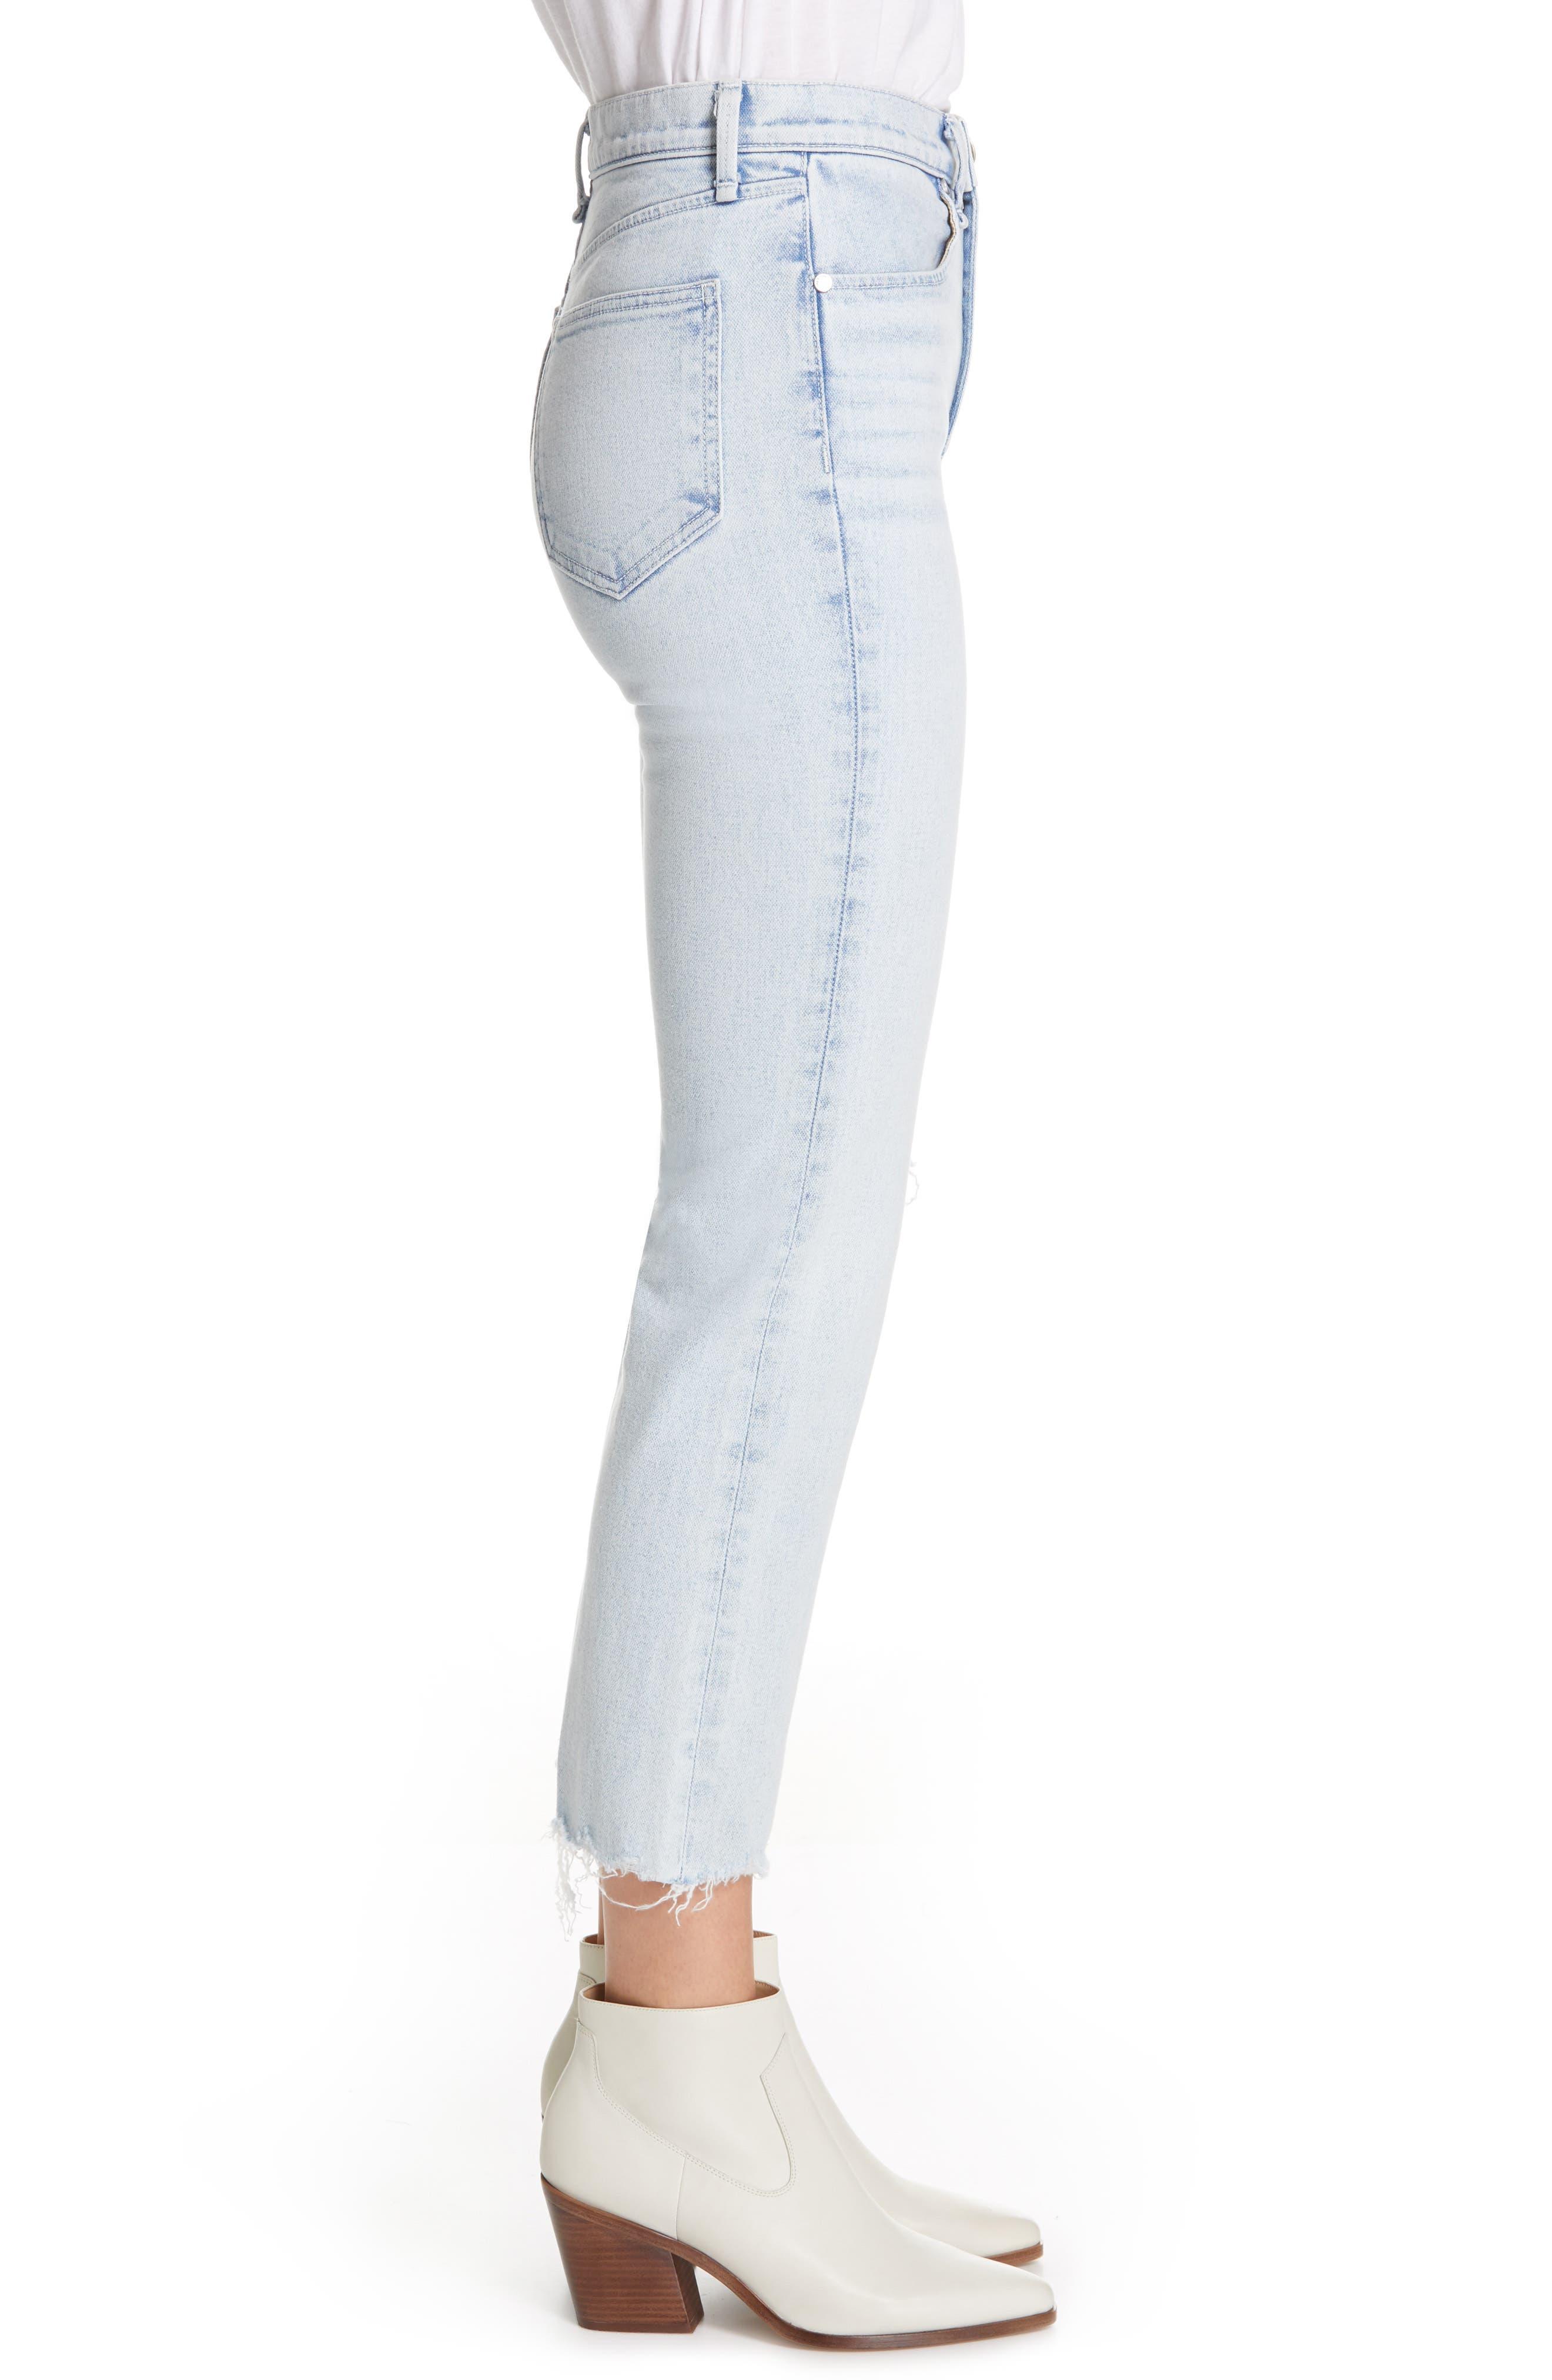 RAG & BONE, JEAN High Waist Ripped Ankle Cigarette Jeans, Alternate thumbnail 4, color, 450